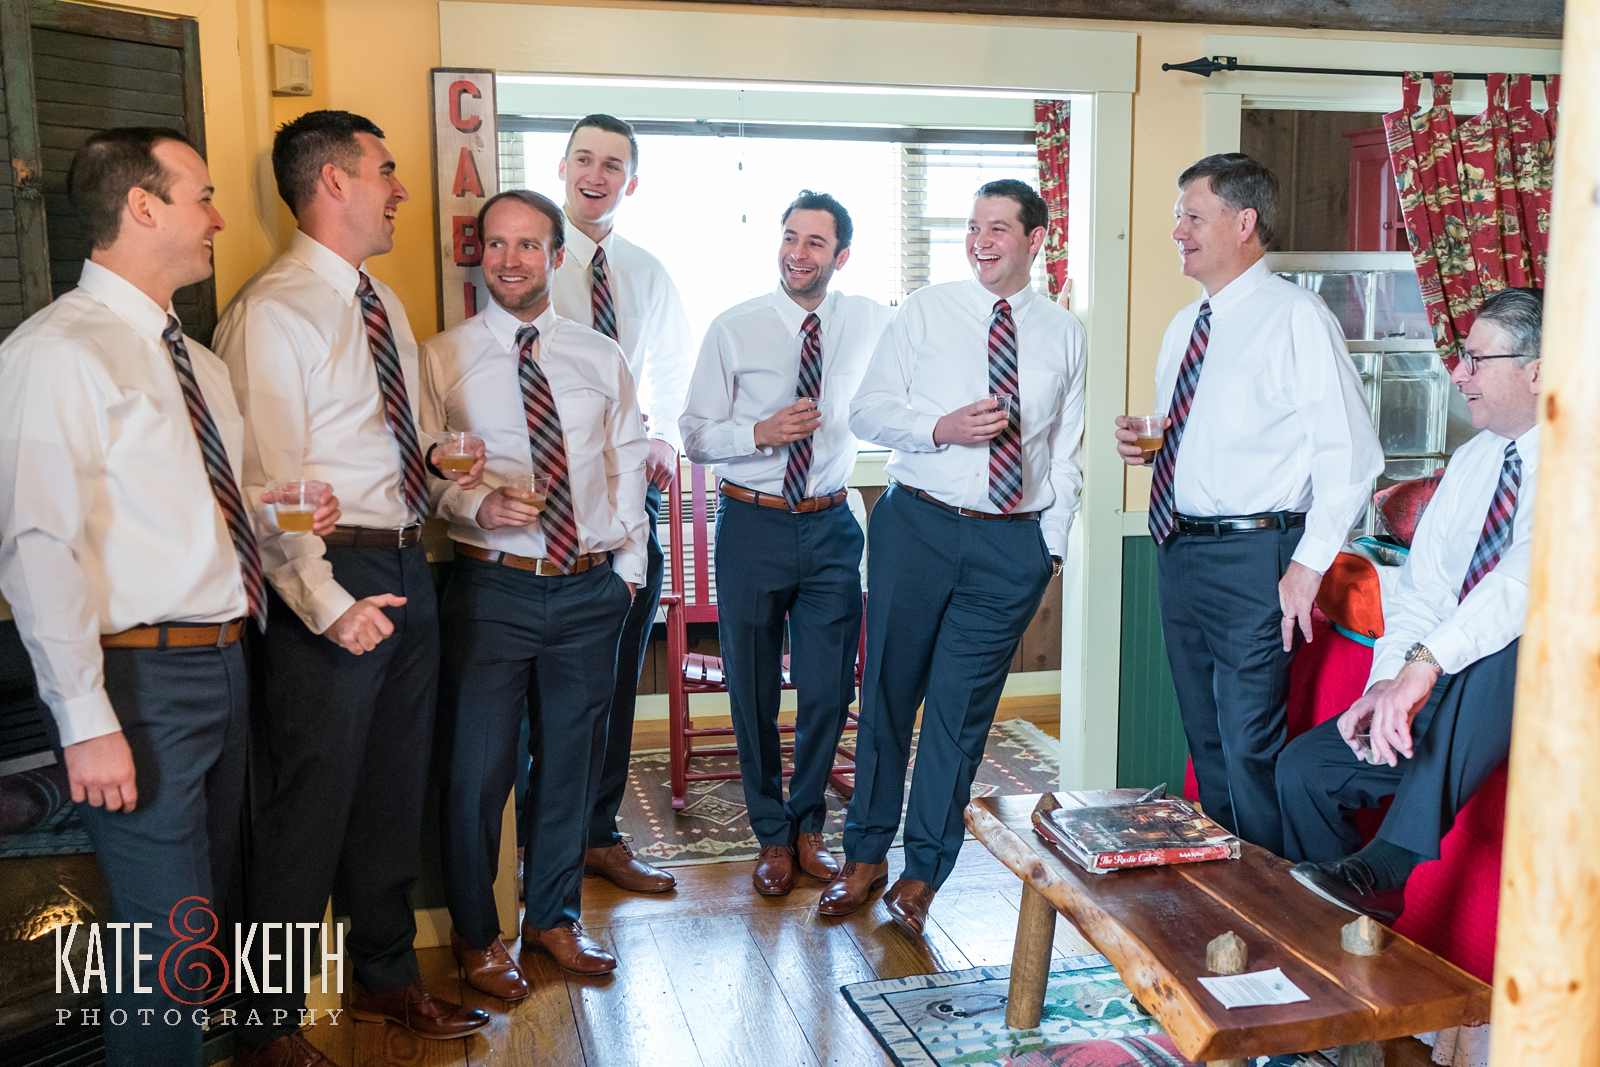 Barn at the Pemi wedding, groom with groomsmen, getting ready, matching ties, unique wedding tie, fun groomsmen, navy suits